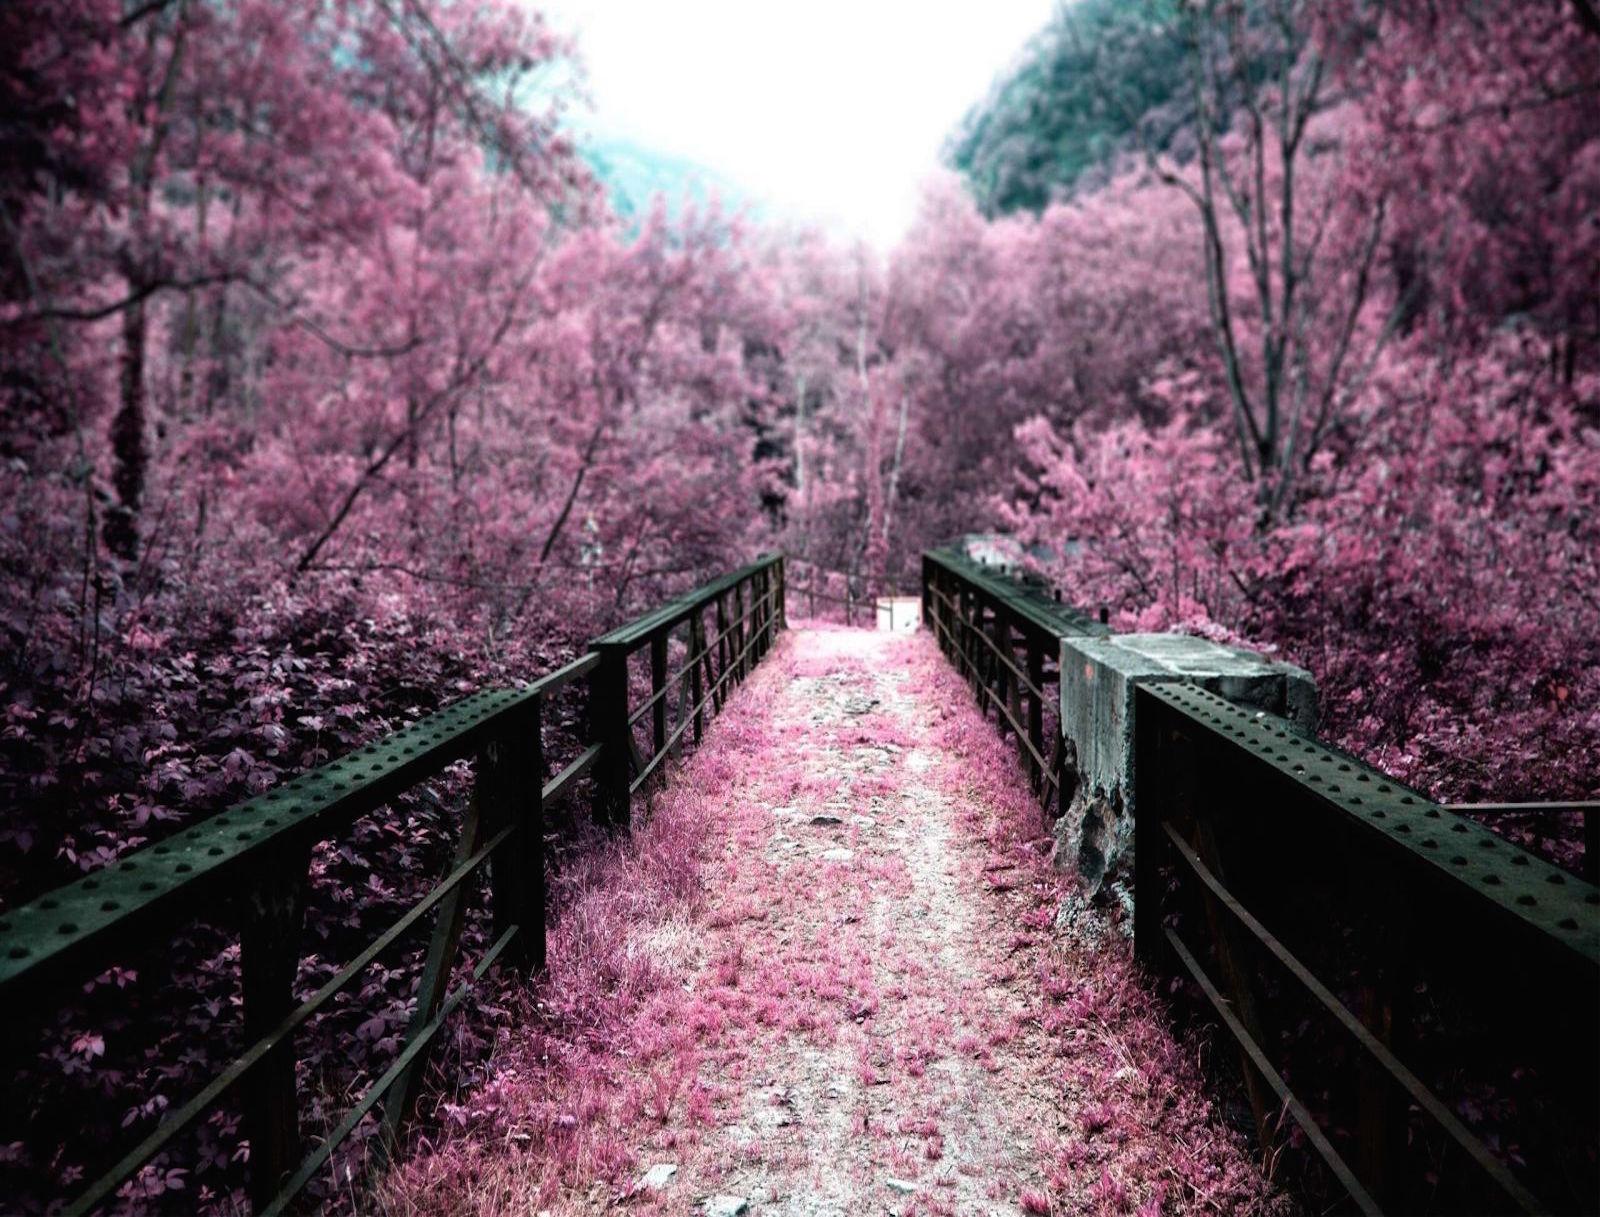 cherry_blossoms_on_a_bridge_hd_wallpaper